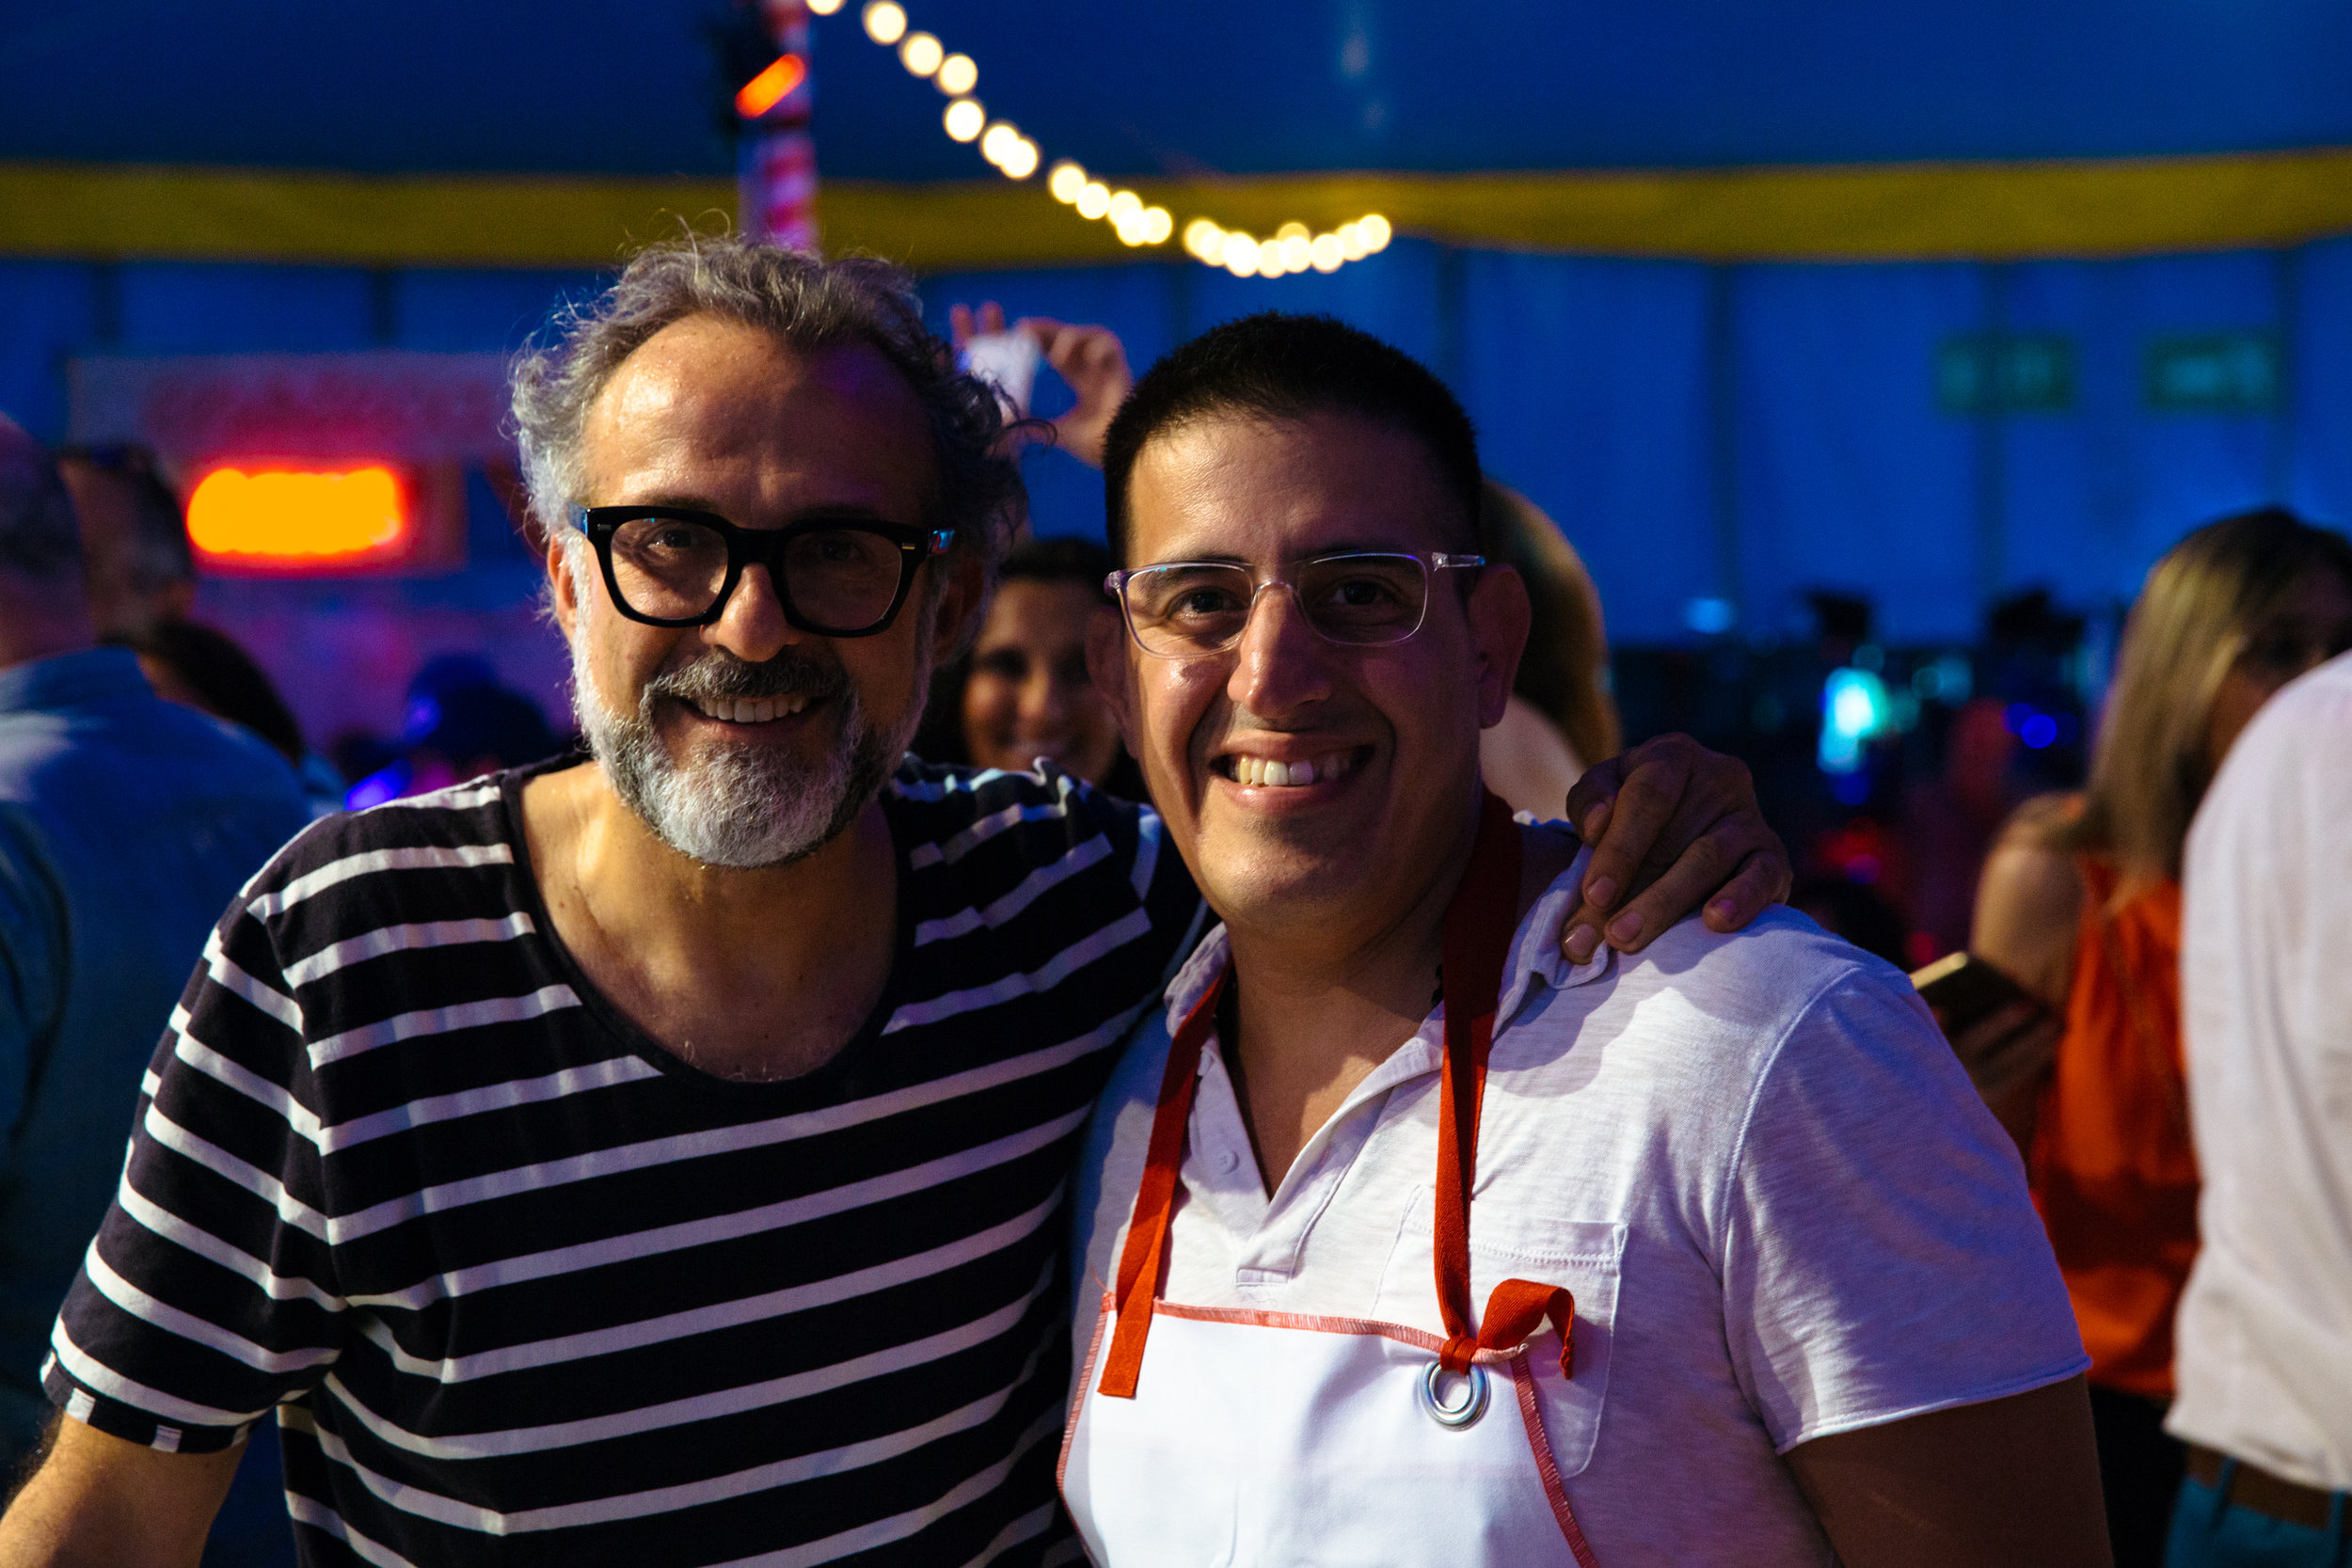 Friends Massimo Buttora & Jefferson Alvarez